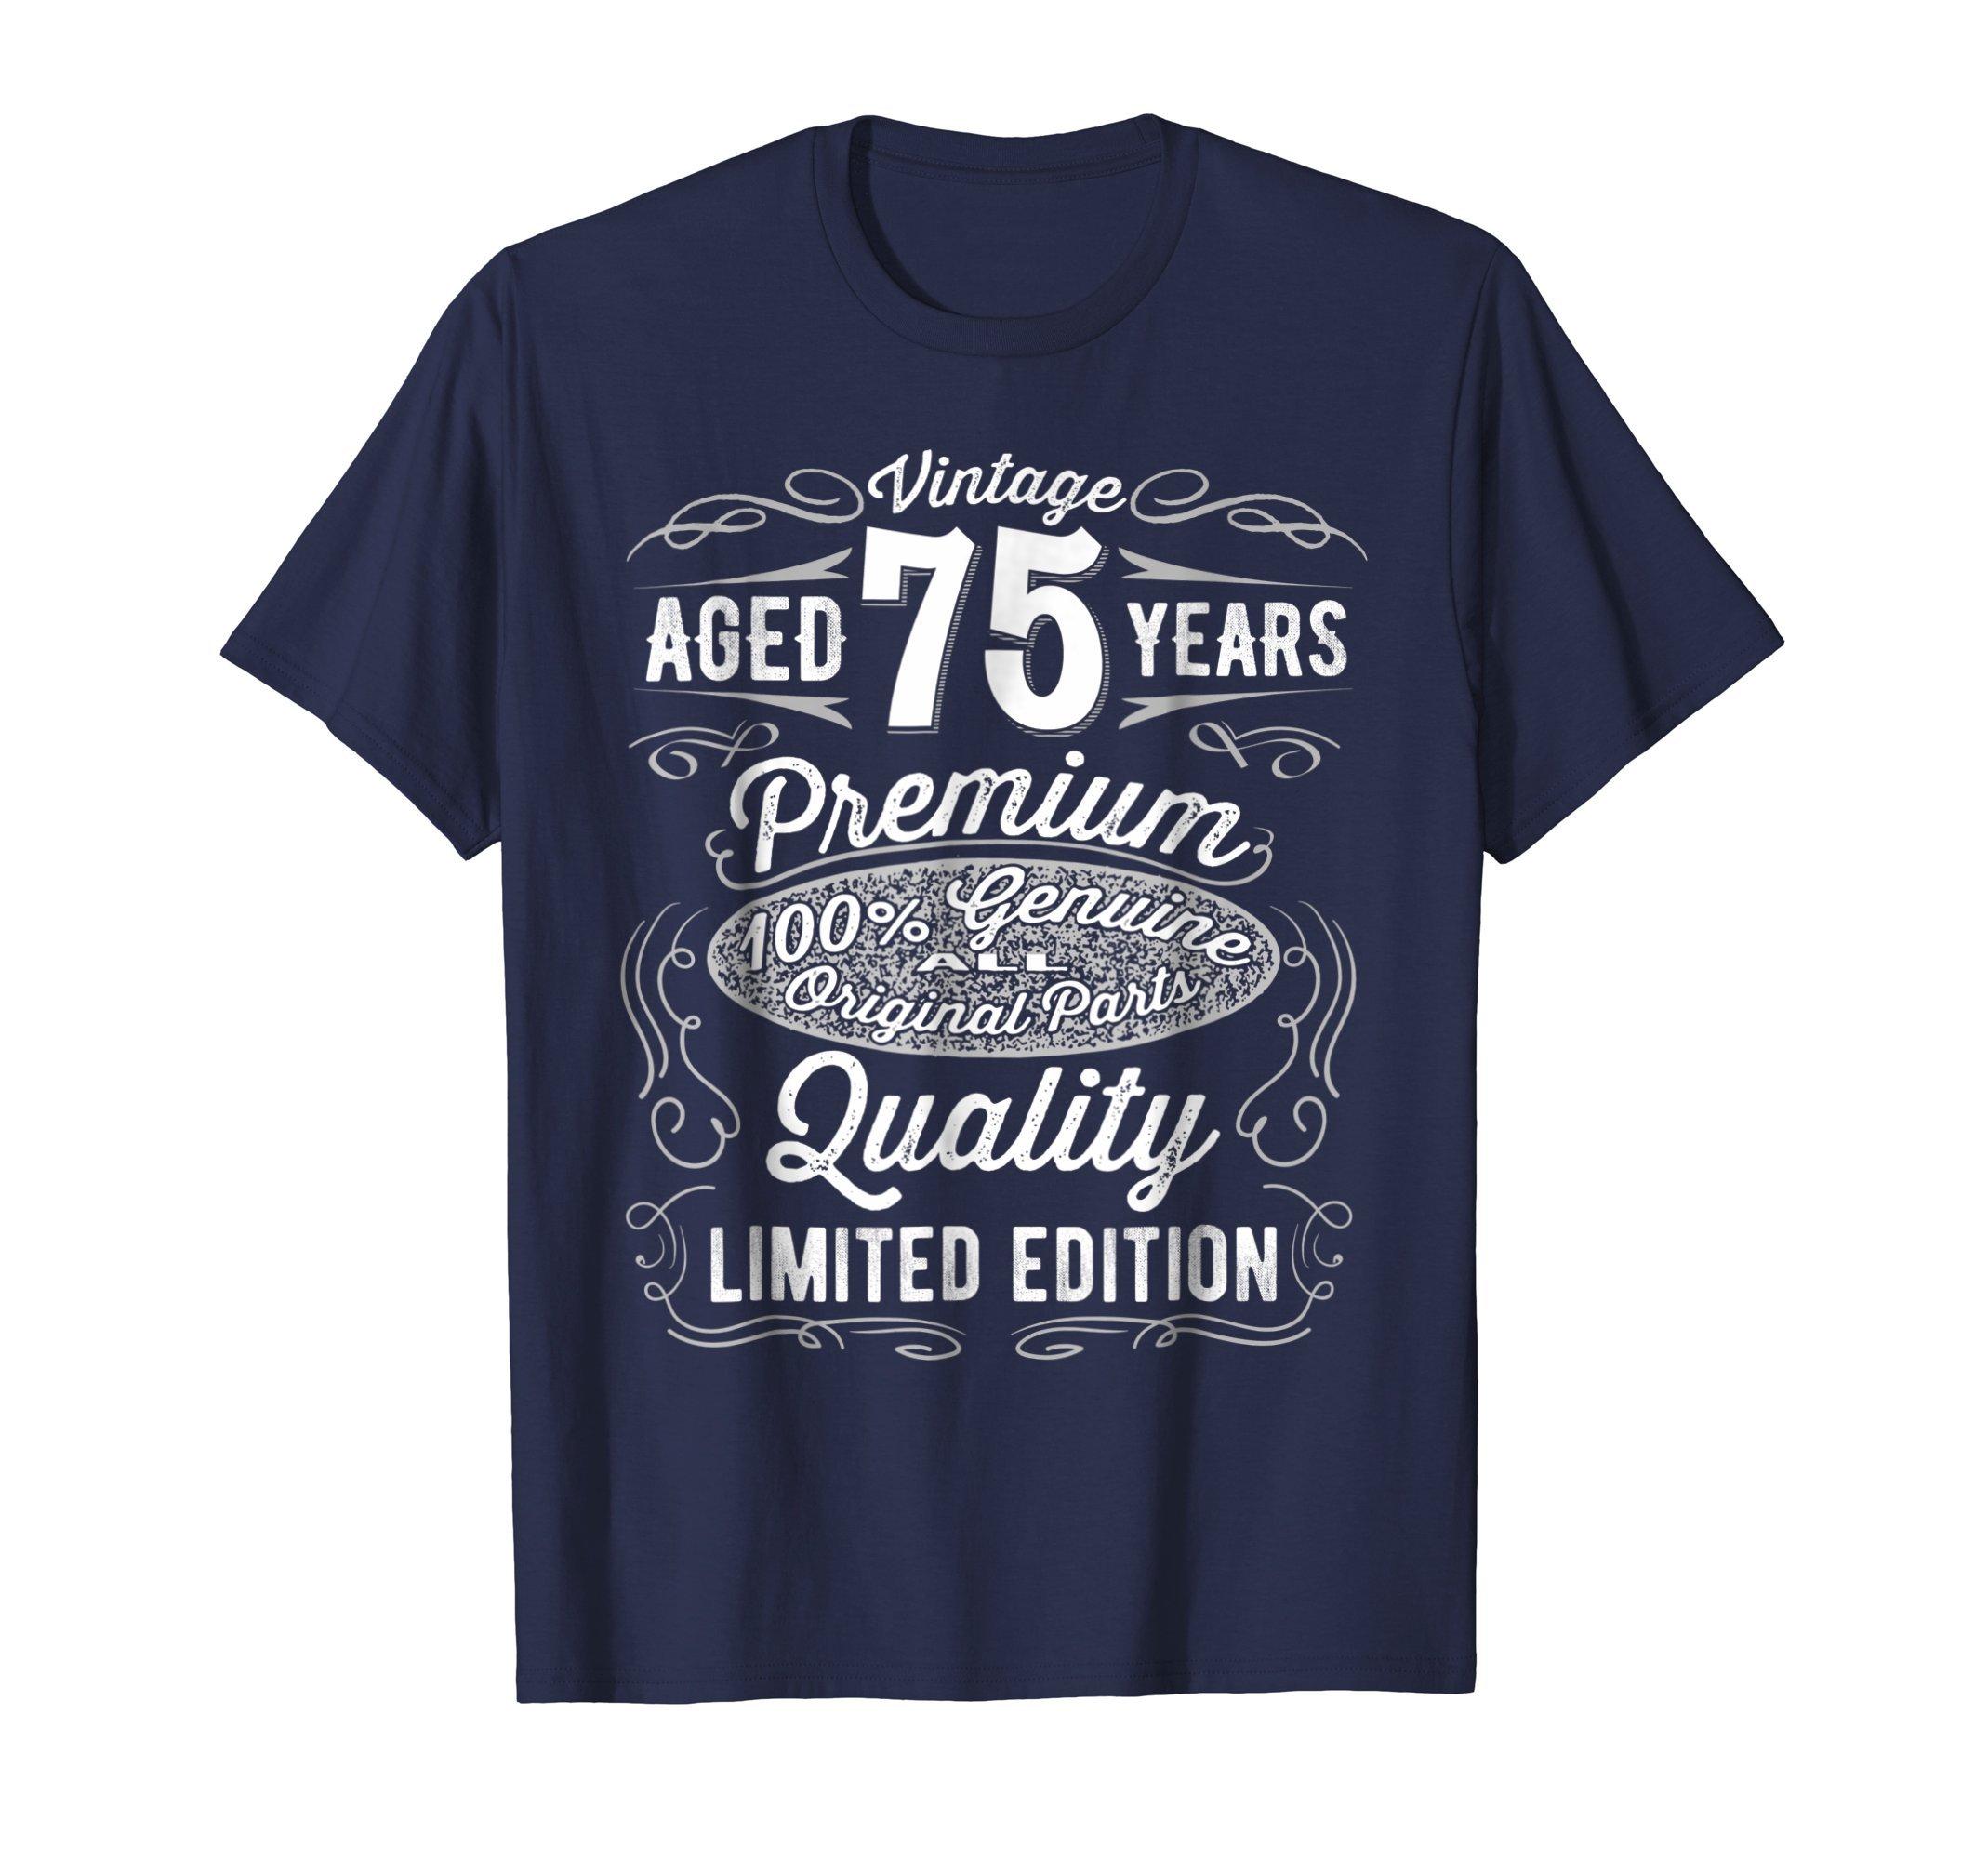 75 Year Old Birthday Gift Vintage YR T Shirt